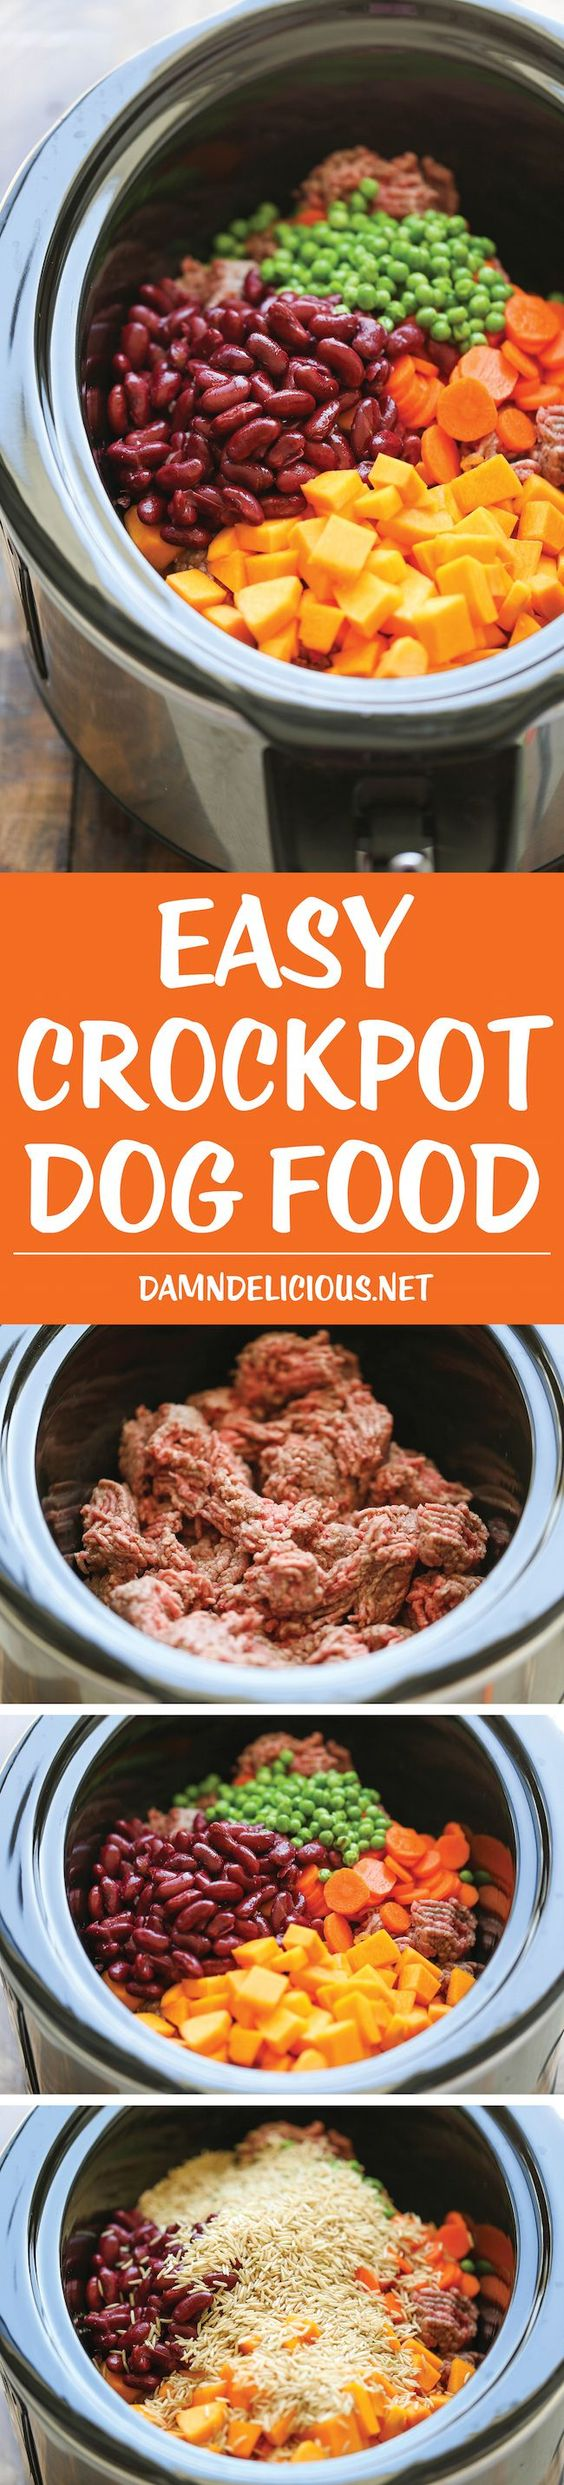 Ground Turkey Rice Dog Food Recipe